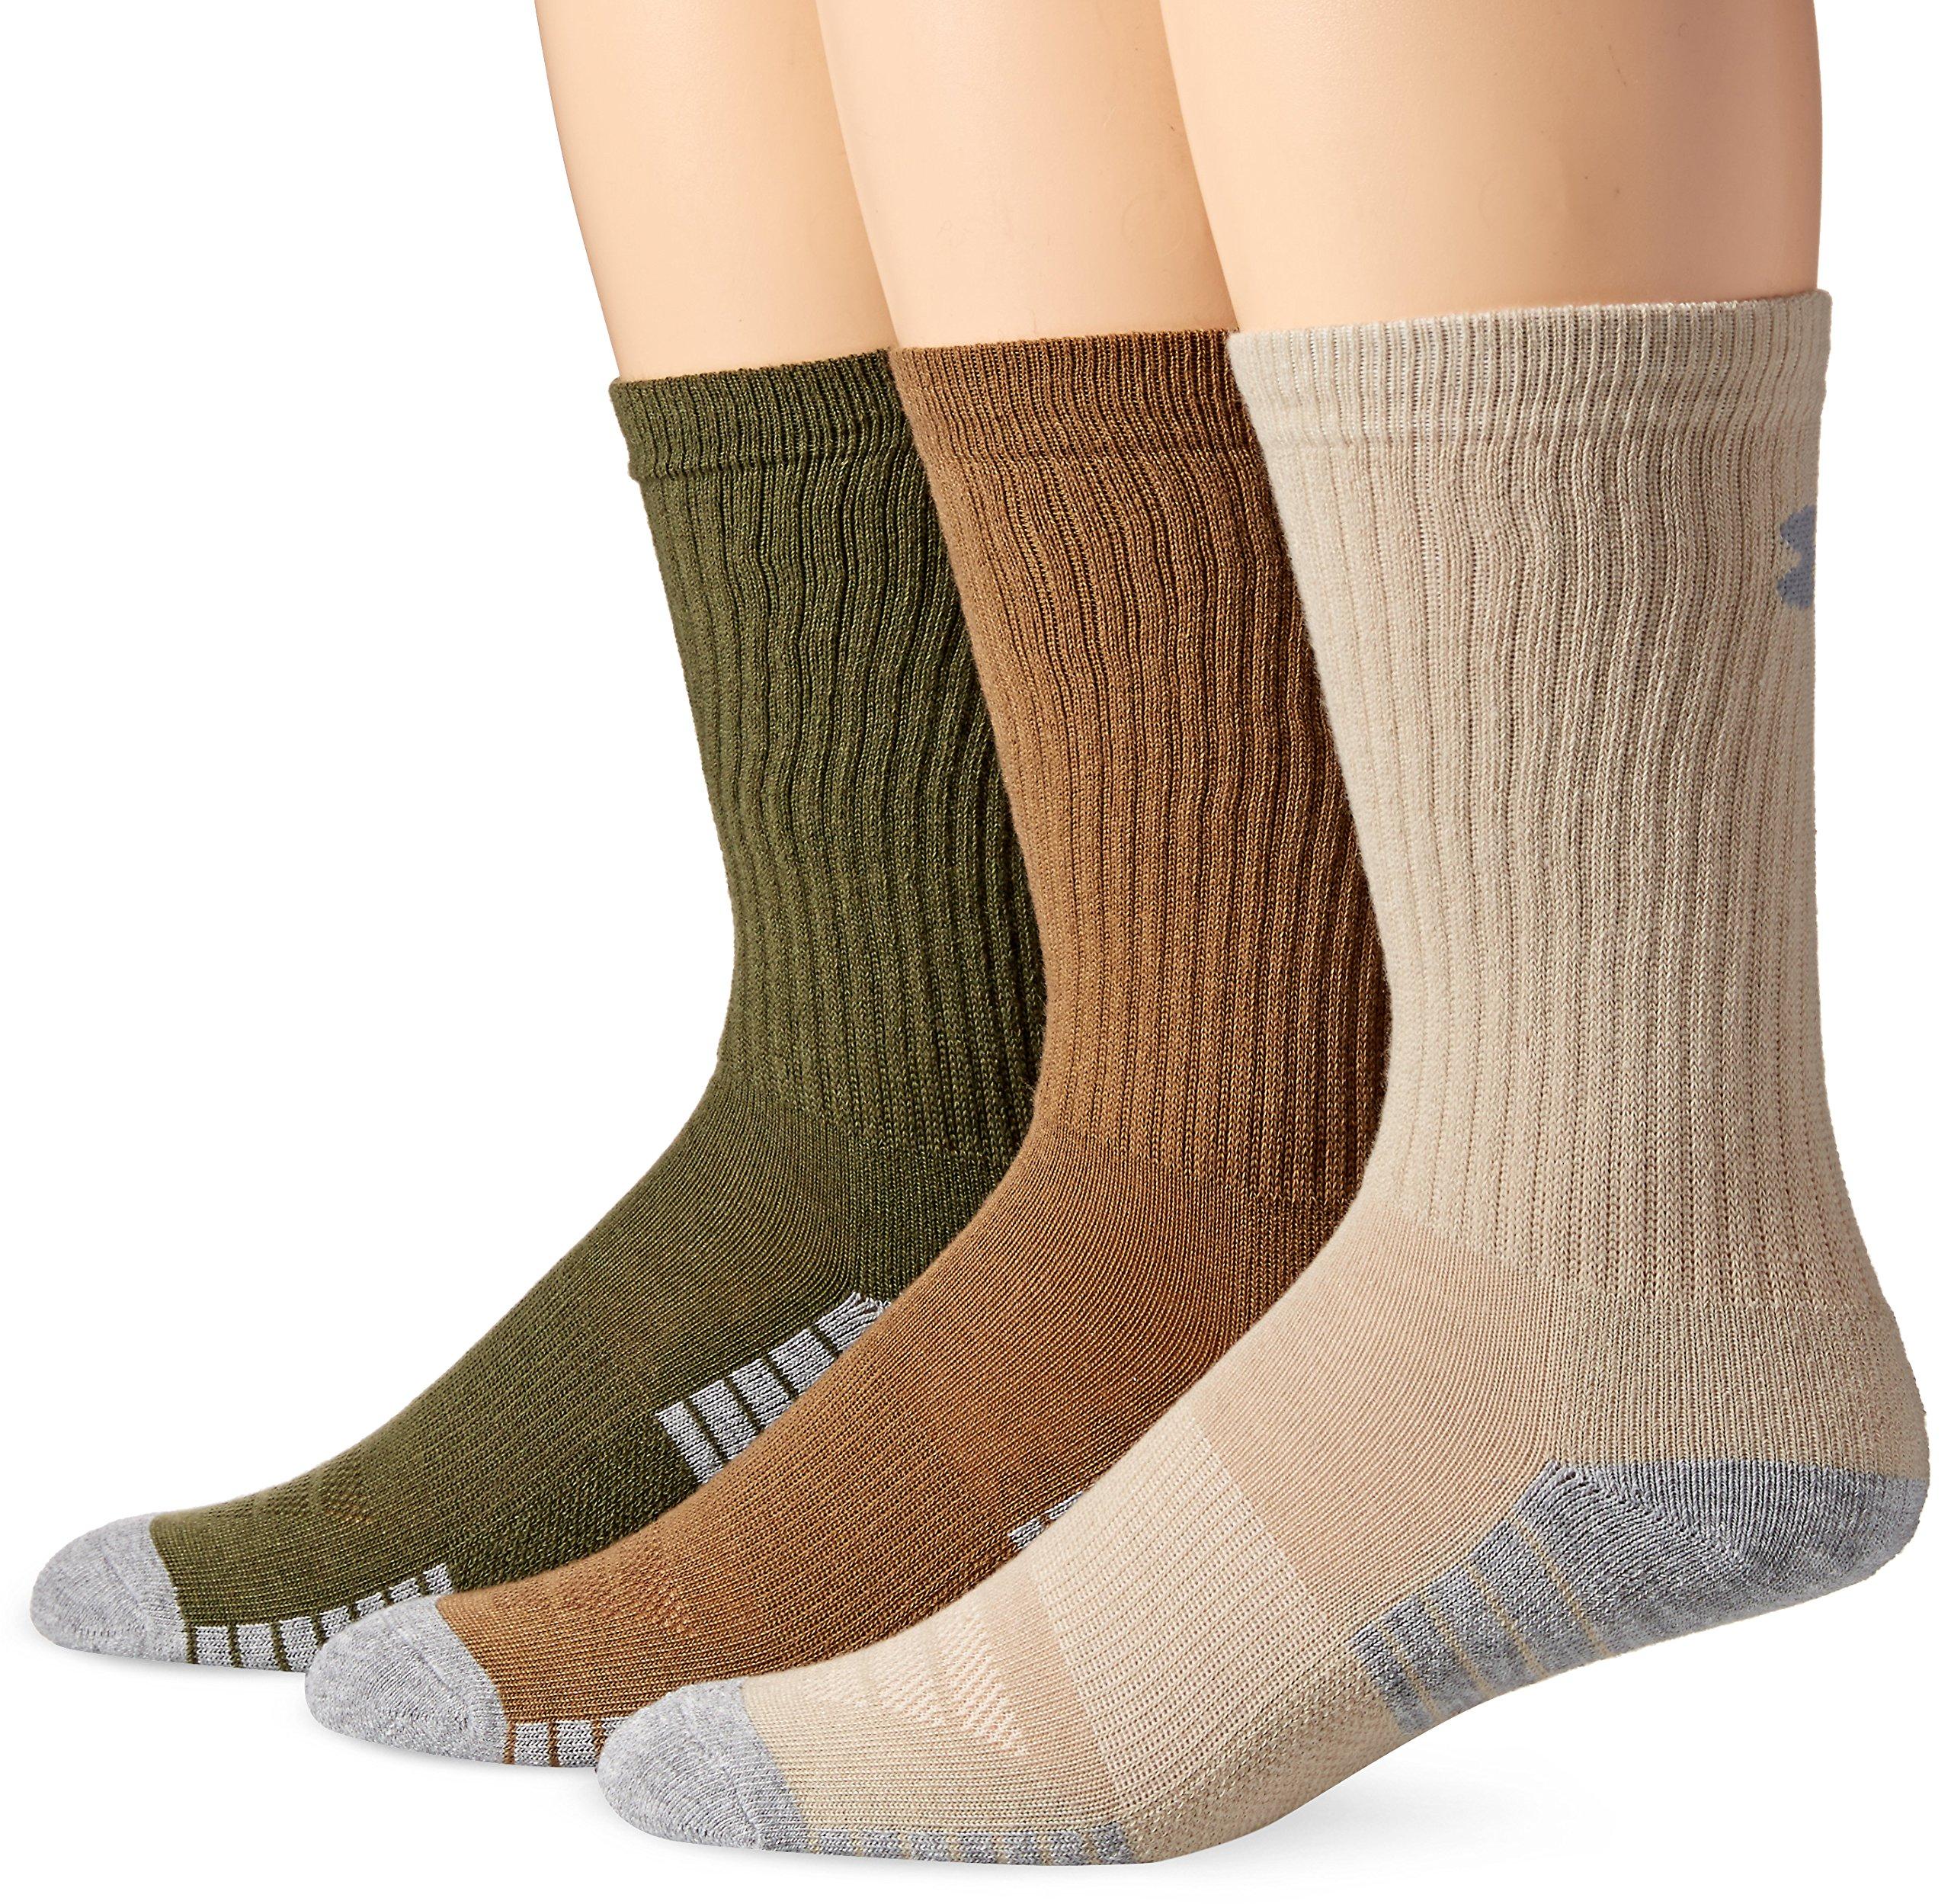 Under Armour Men's Heatgear Tech Crew Socks, Coyote Brown Assortment, Medium (3 Pair Pack) by Under Armour